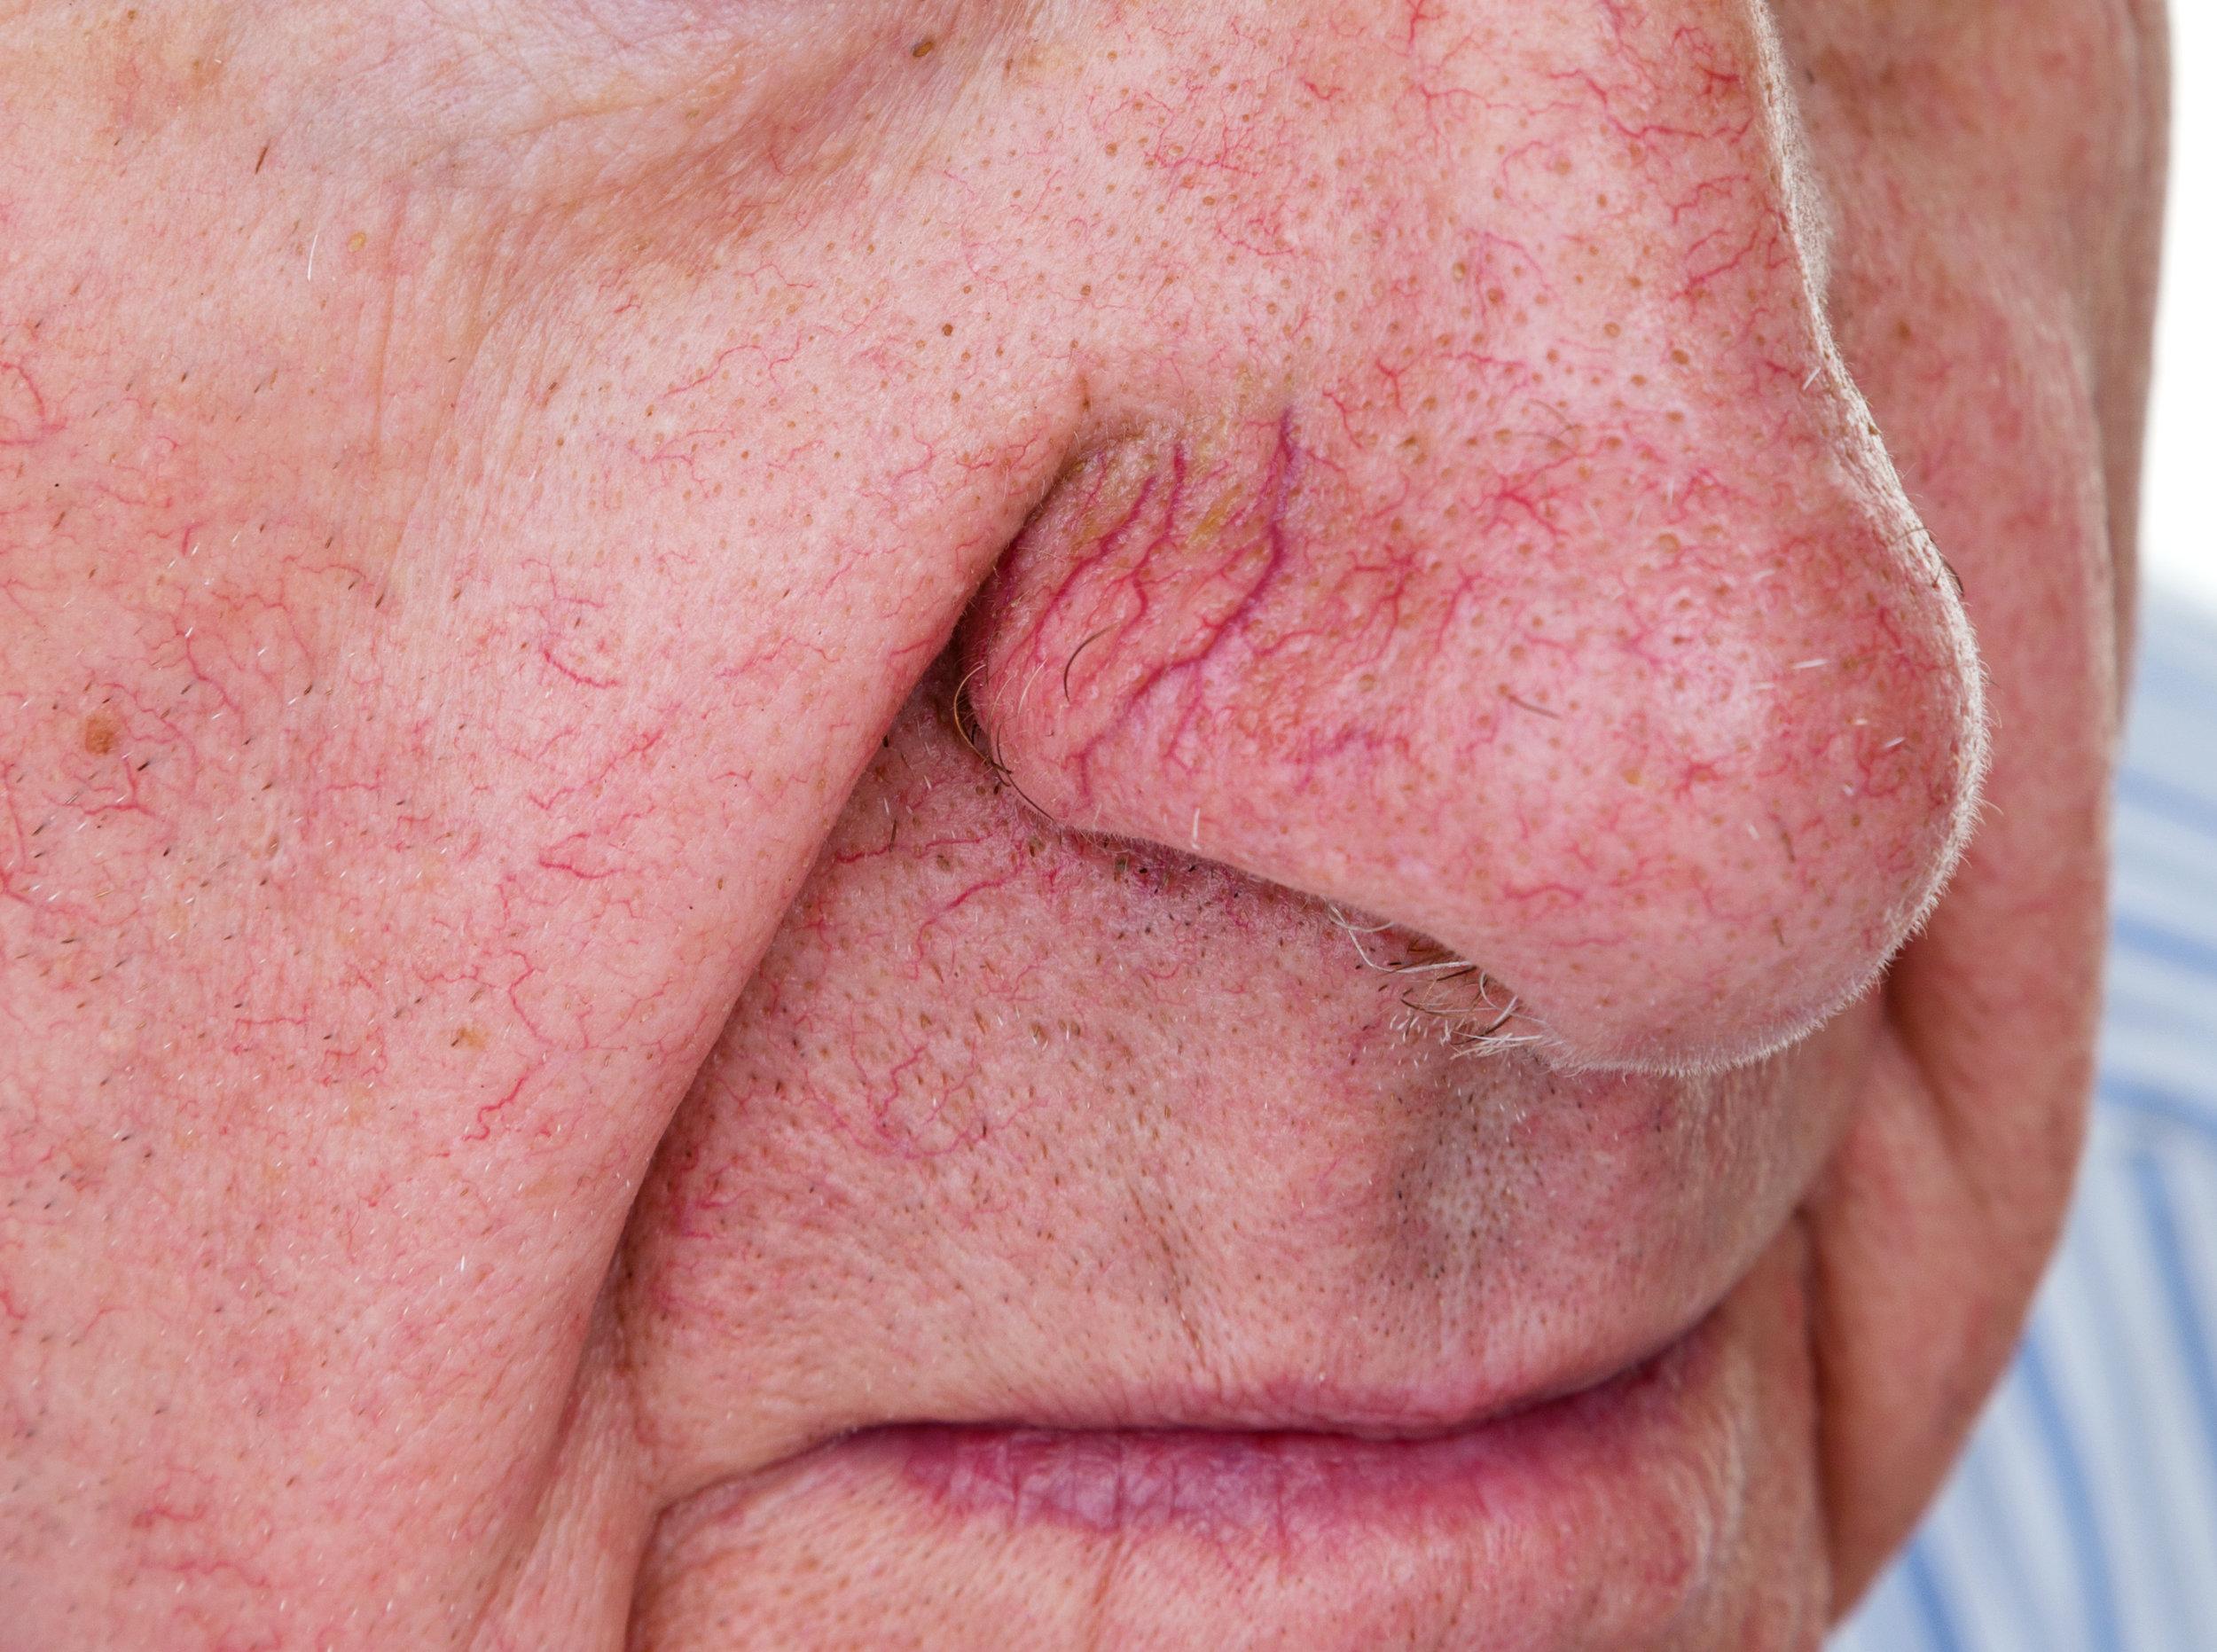 Facial Vein Rosacea Treatment Maine Laser And Aesthetics Llc